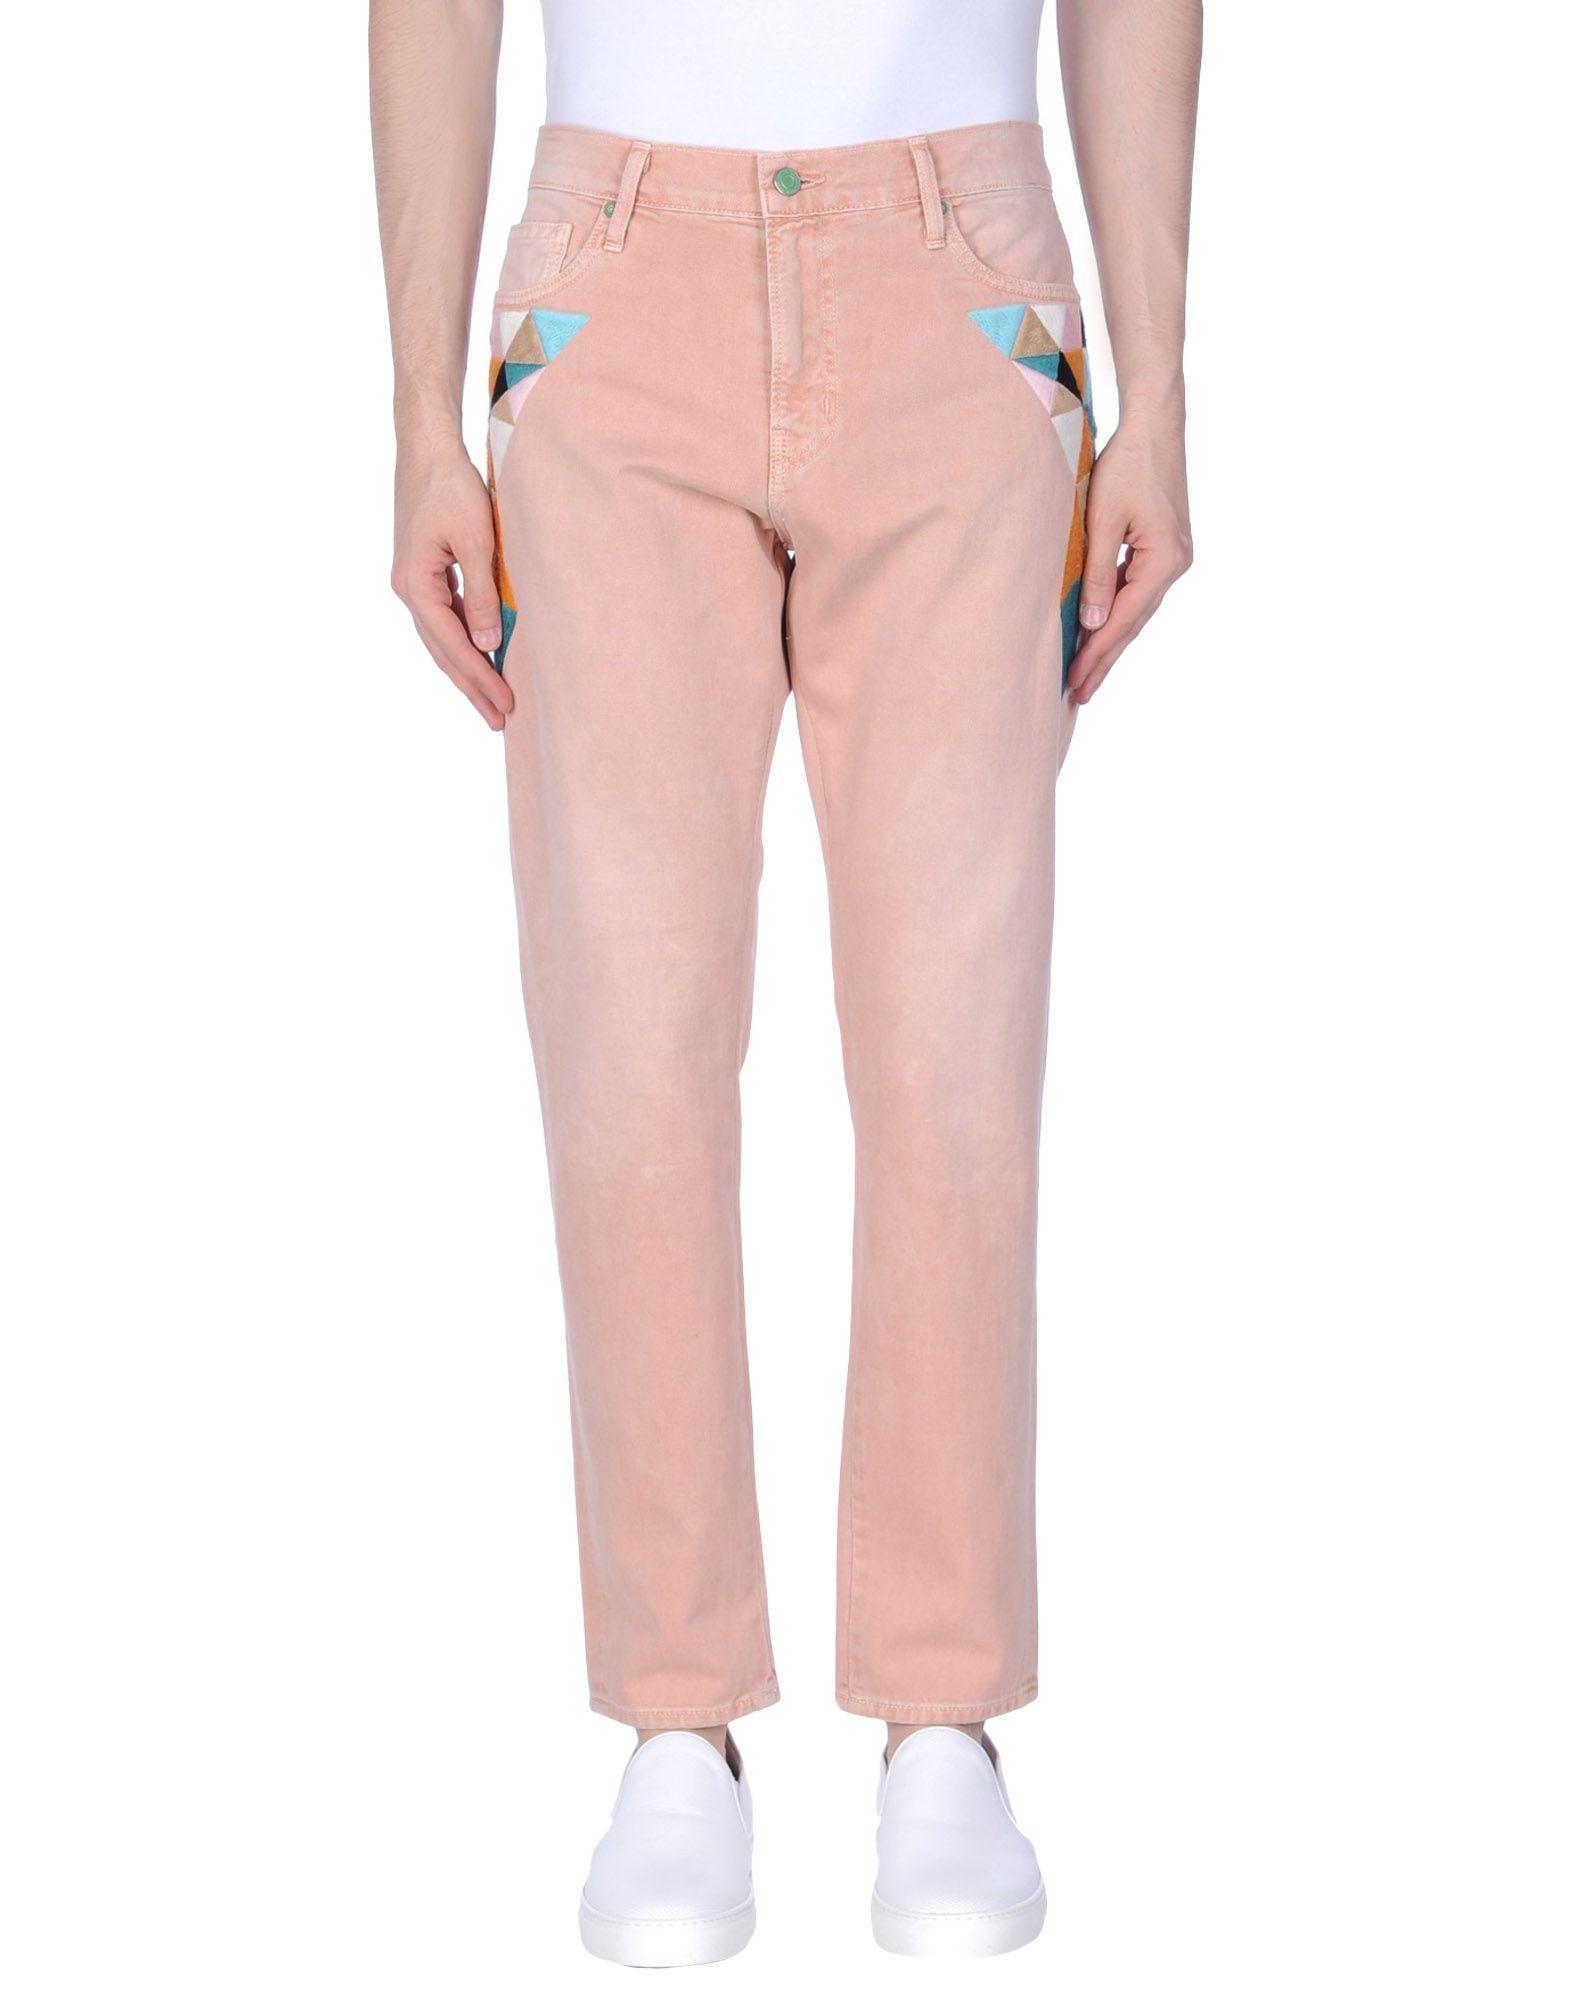 SANDRINE ROSE Herren Jeanshose Farbe Rosa Größe 6 - broschei